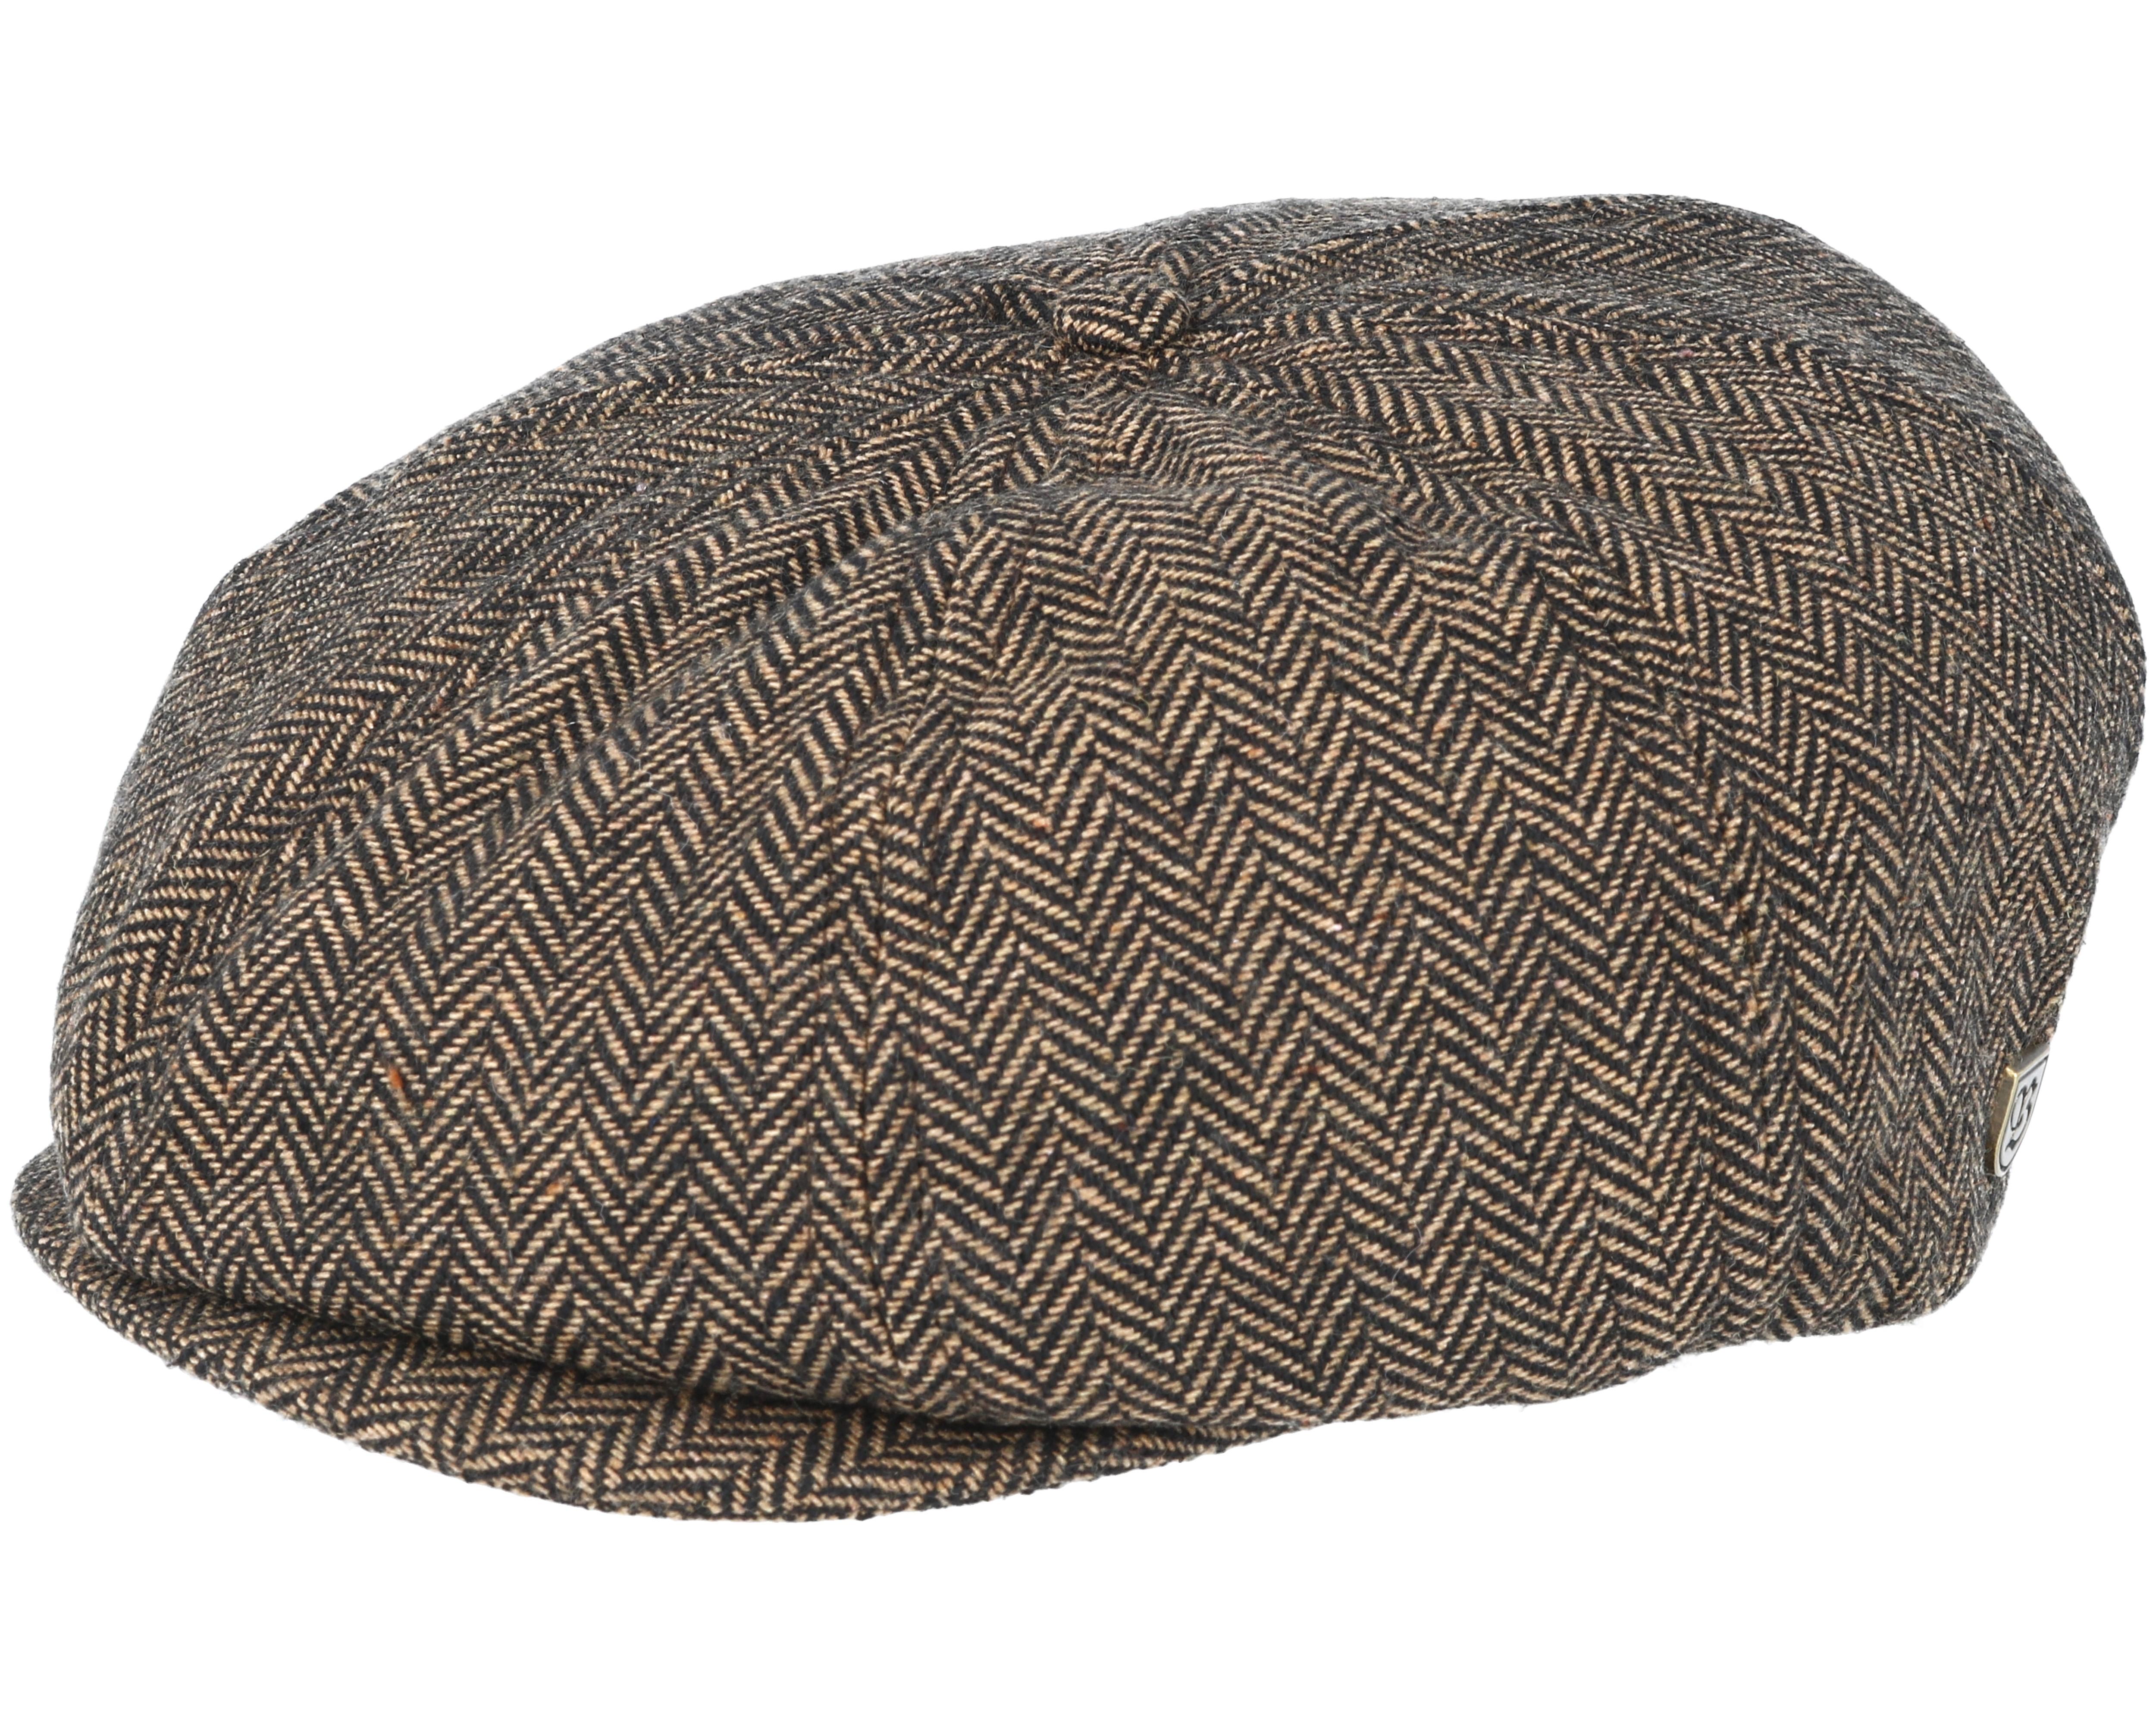 Brood Brown Khaki Flat Cap - Brixton caps  8f428aa2efa